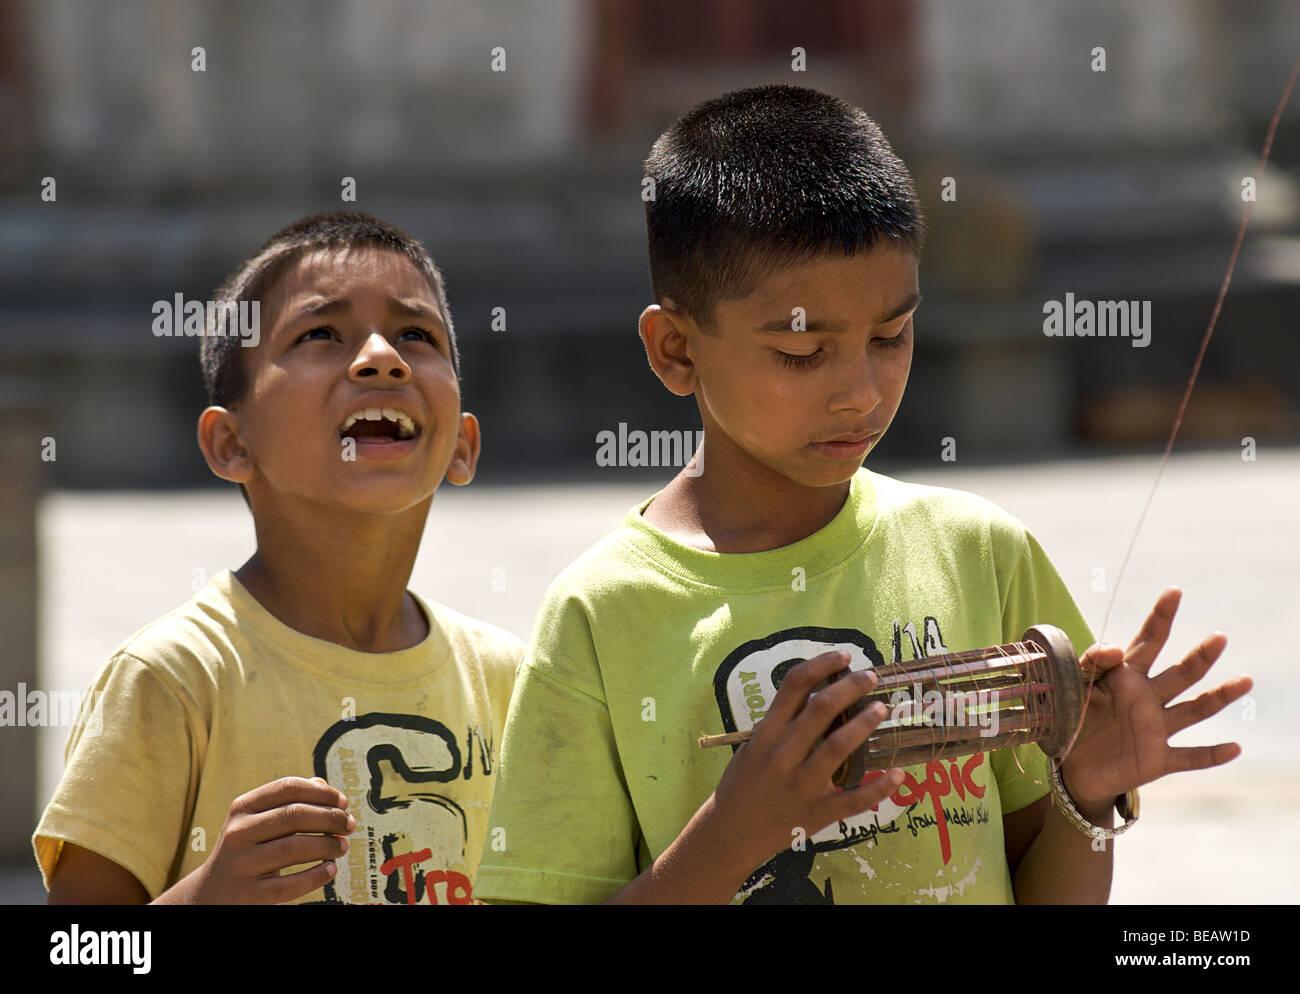 Nepalese boys kite flying with kite reel  in hand, Kathmandhu, Nepal - Stock Image